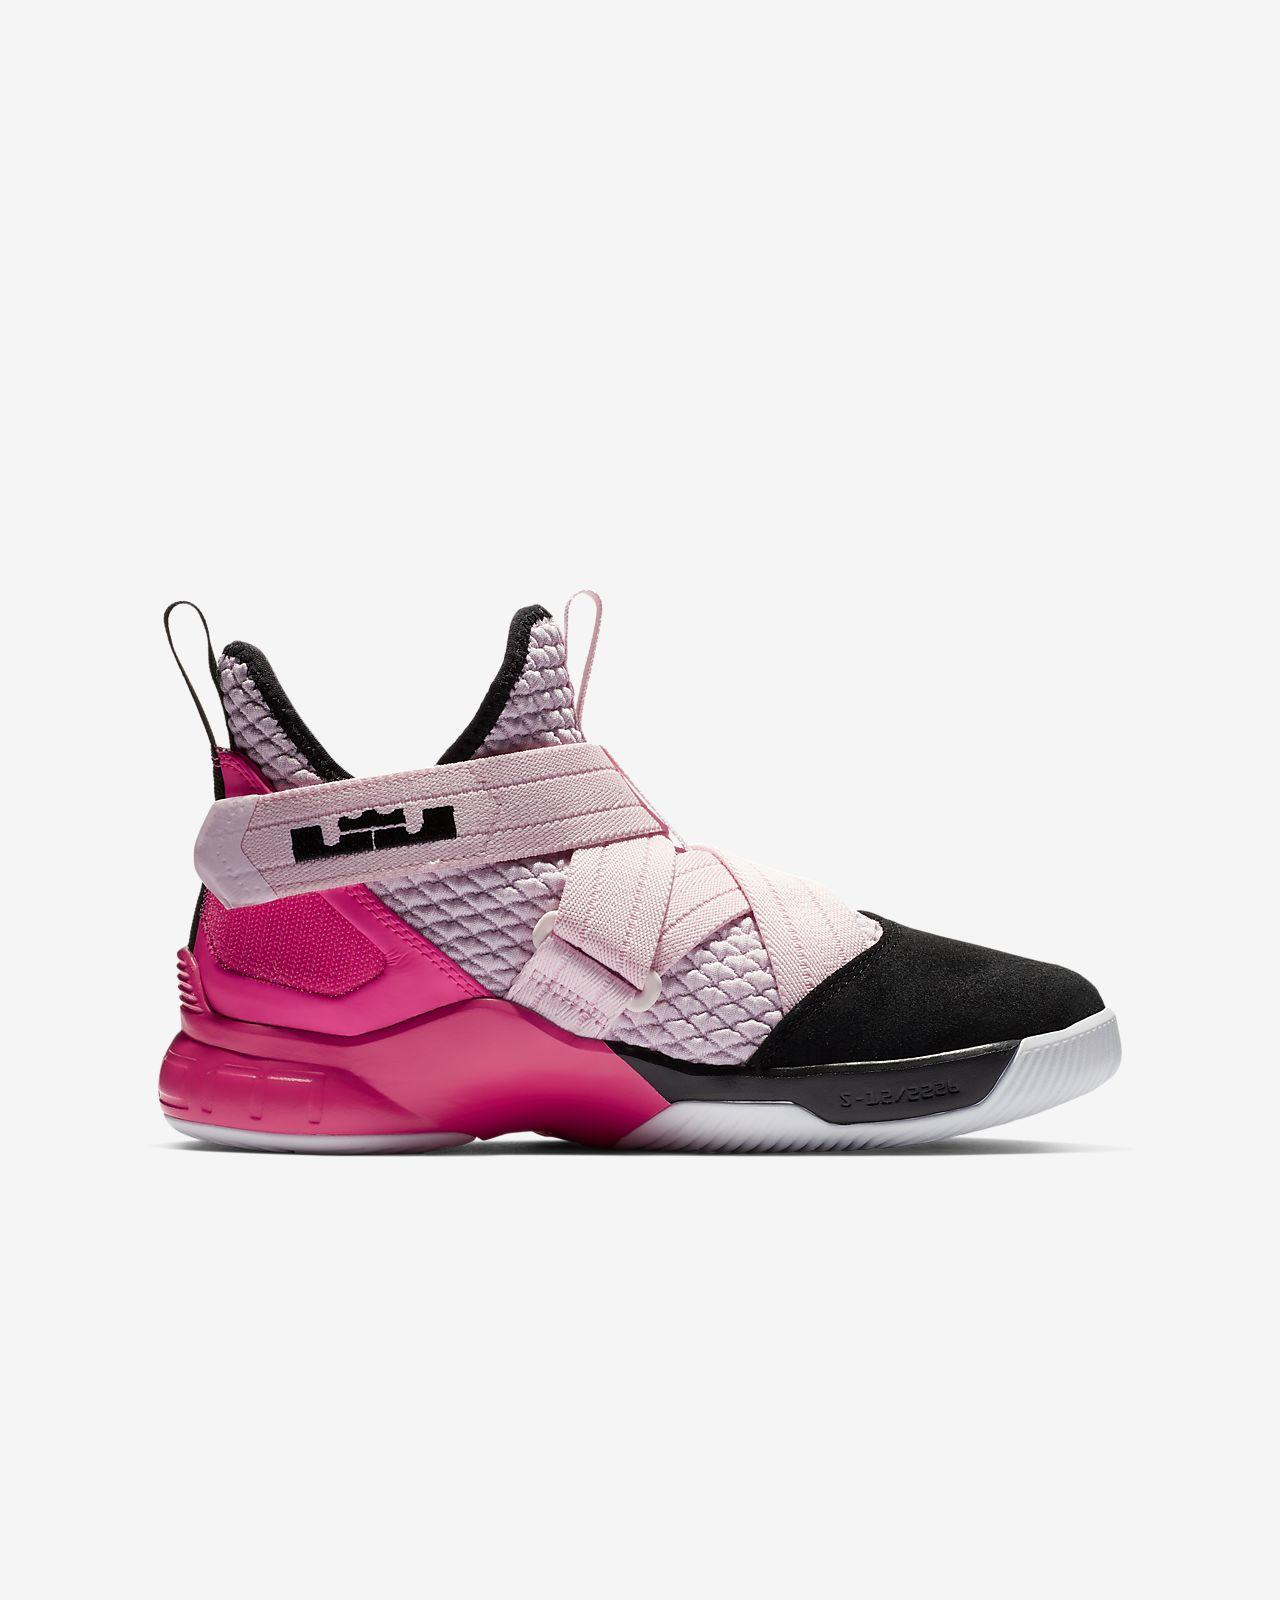 0cd91b49ef9b LeBron Soldier XII Big Kids  Basketball Shoe. Nike.com